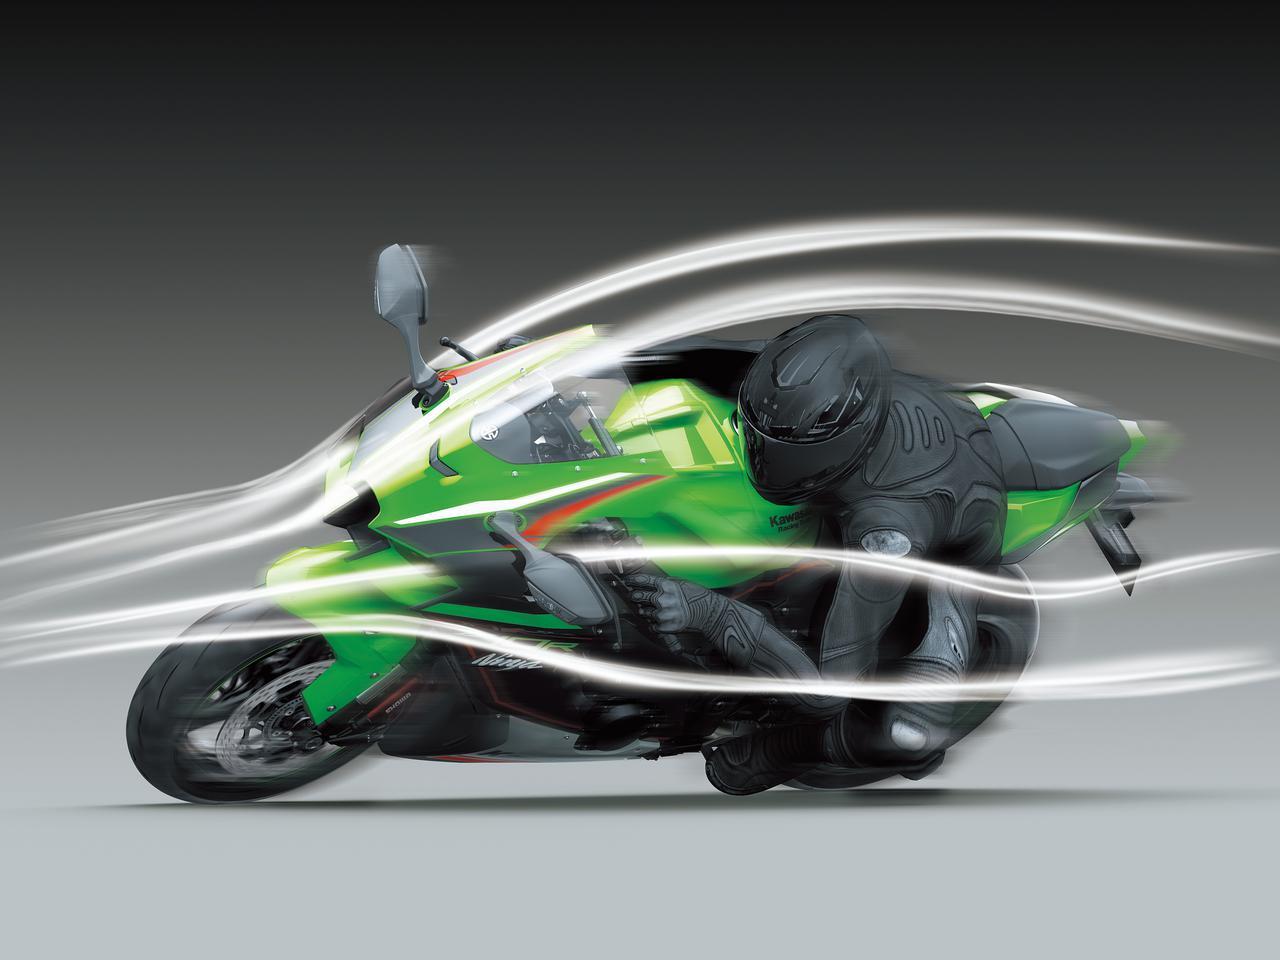 Images : 7番目の画像 - 【写真8枚】カワサキ「Ninja ZX-10R」「Ninja ZX-10RR」 - webオートバイ